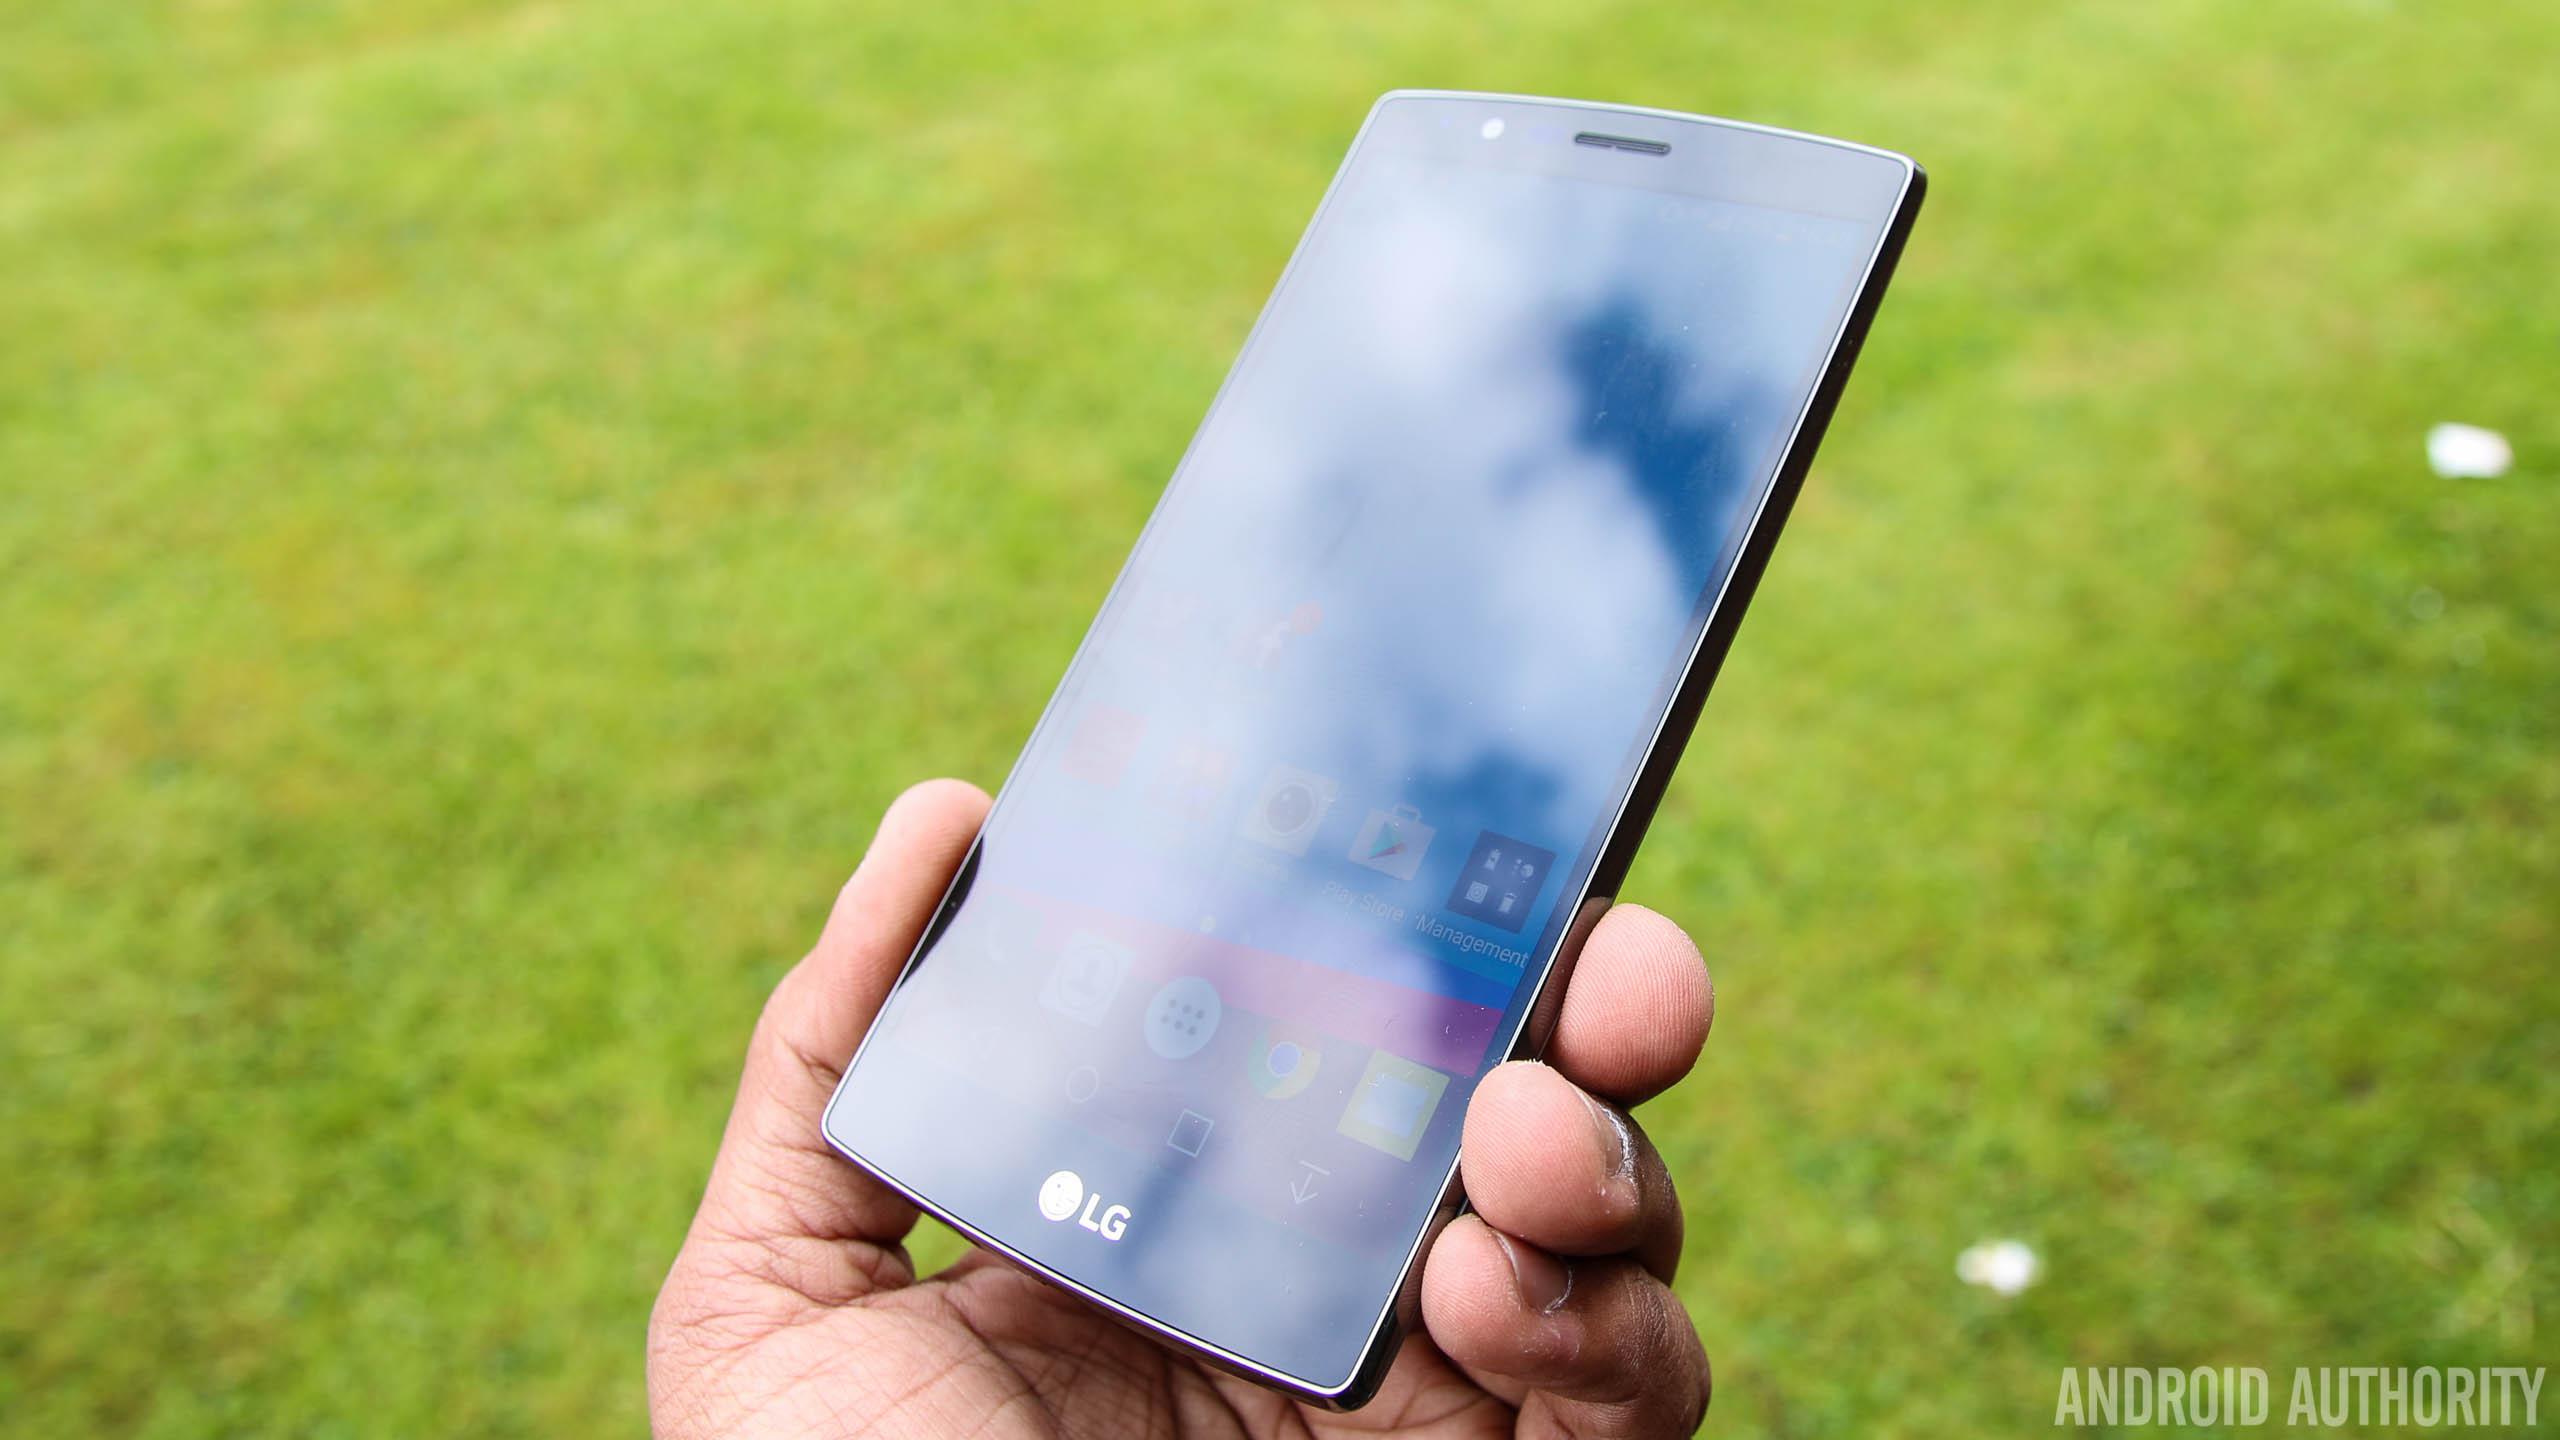 LG G4 impressions: 10 days later